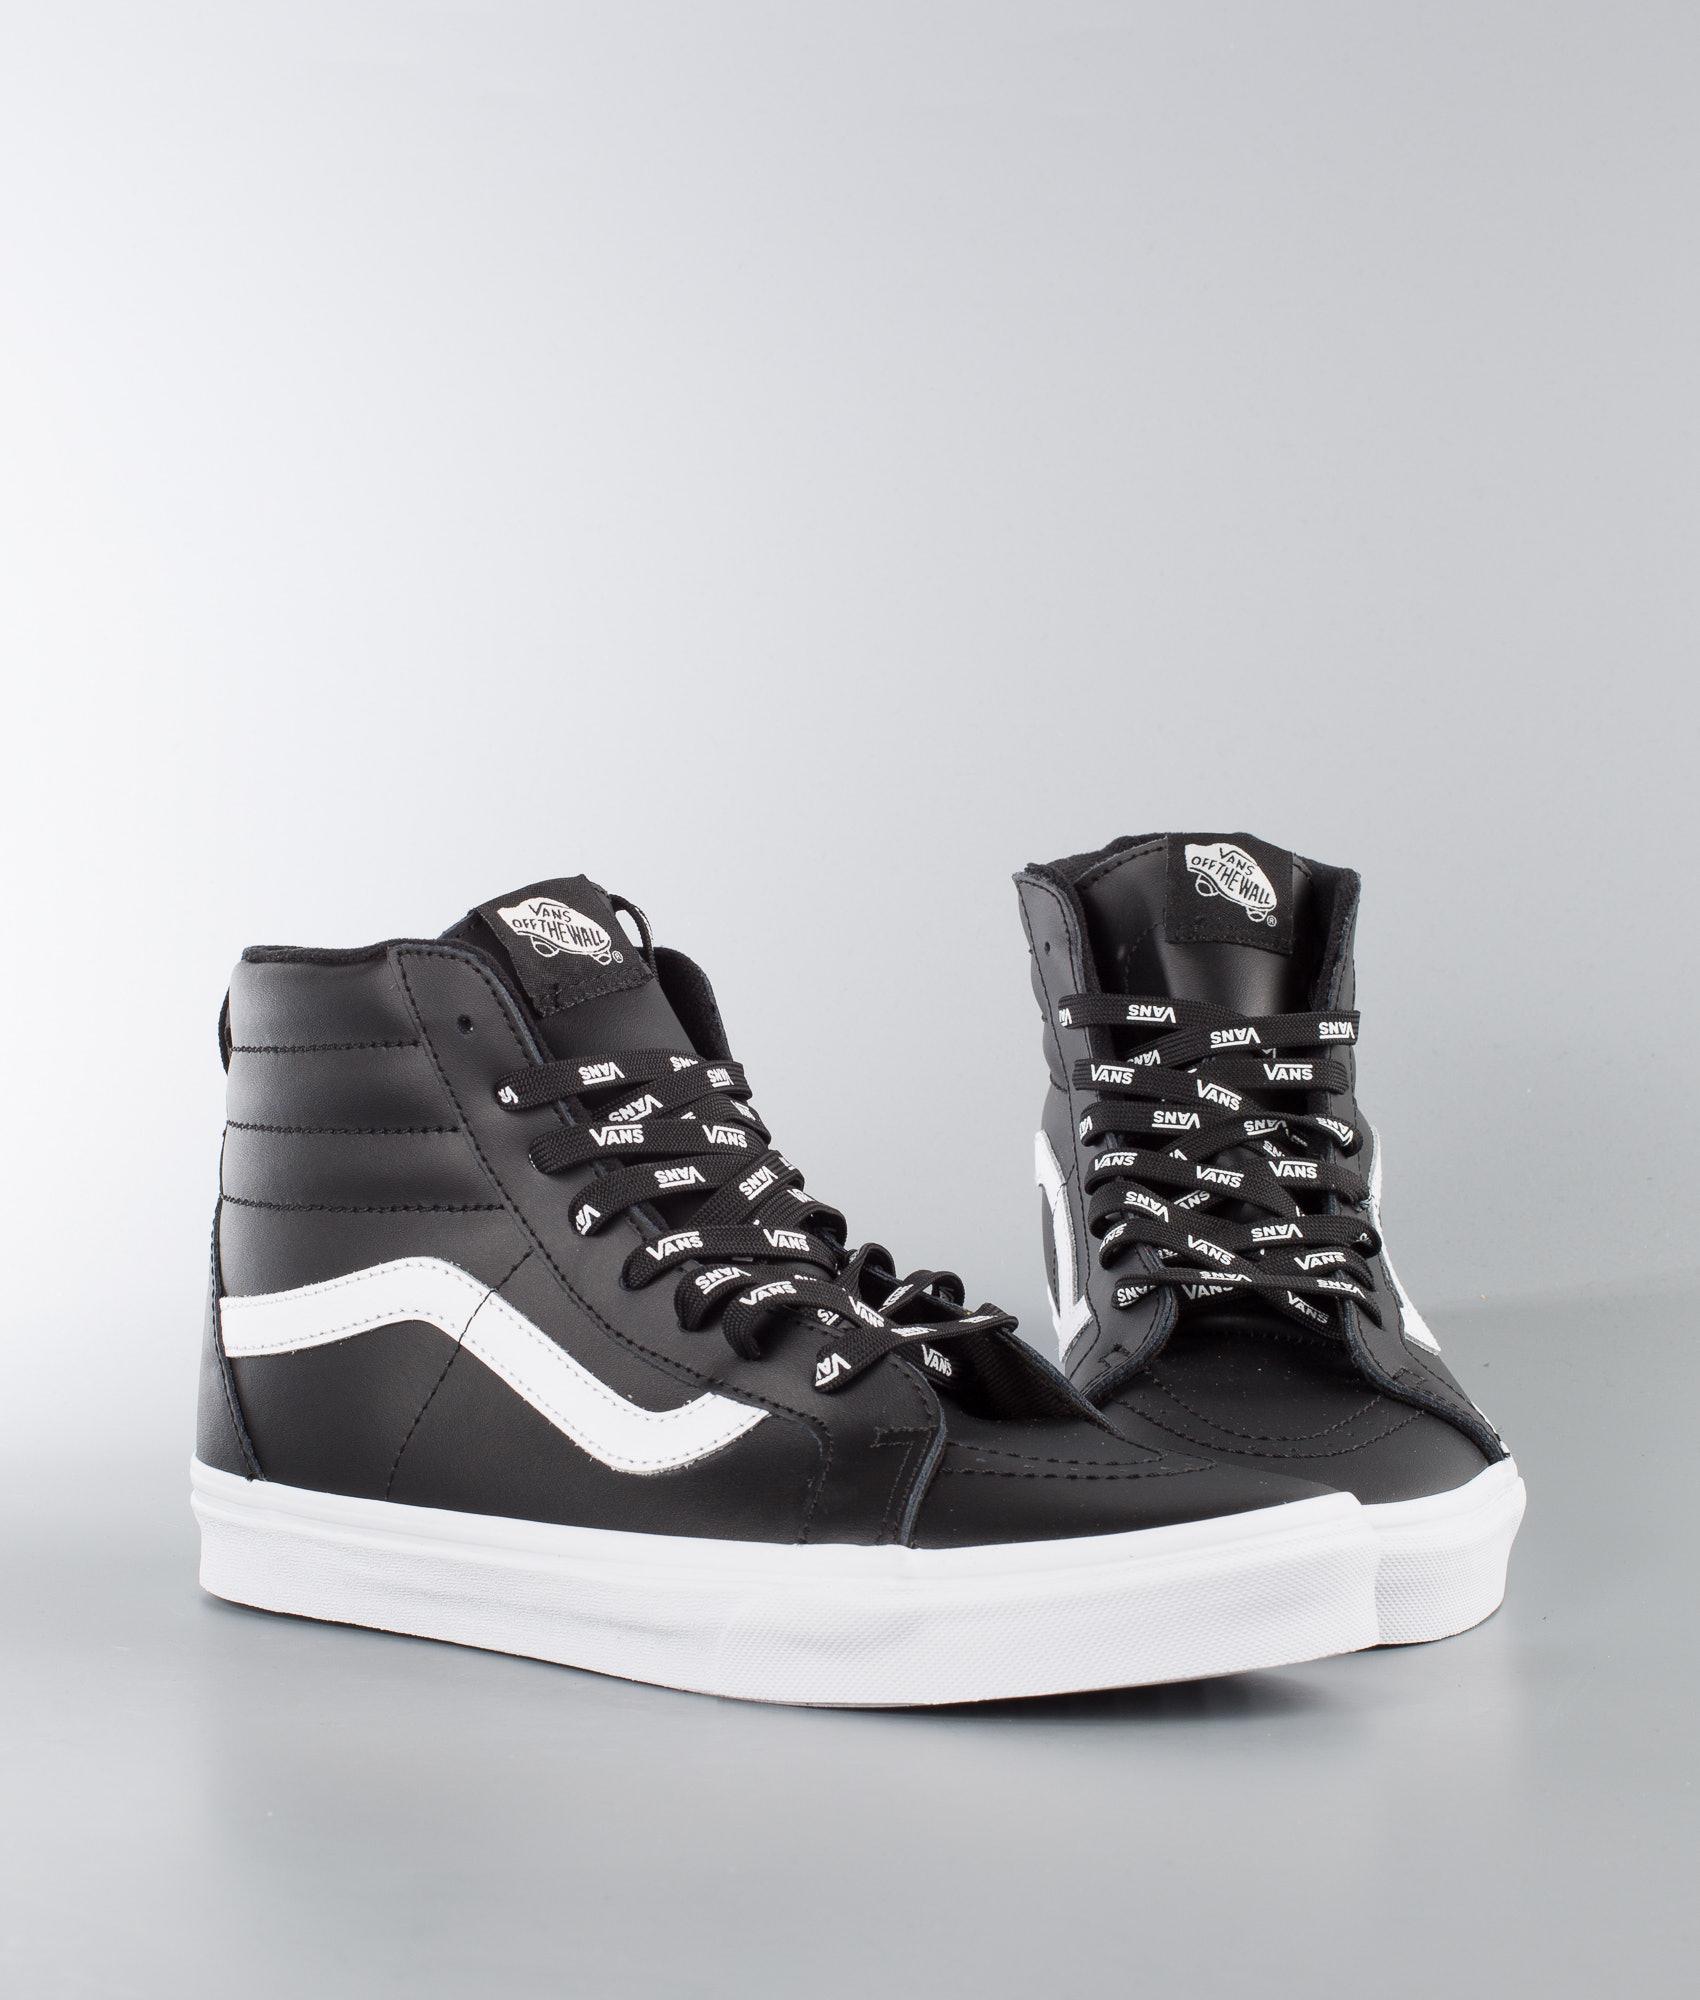 418c2a8ea5 Vans Sk8-Hi Reissue Shoes (Otw Webbing) Black Leather - Ridestore.com